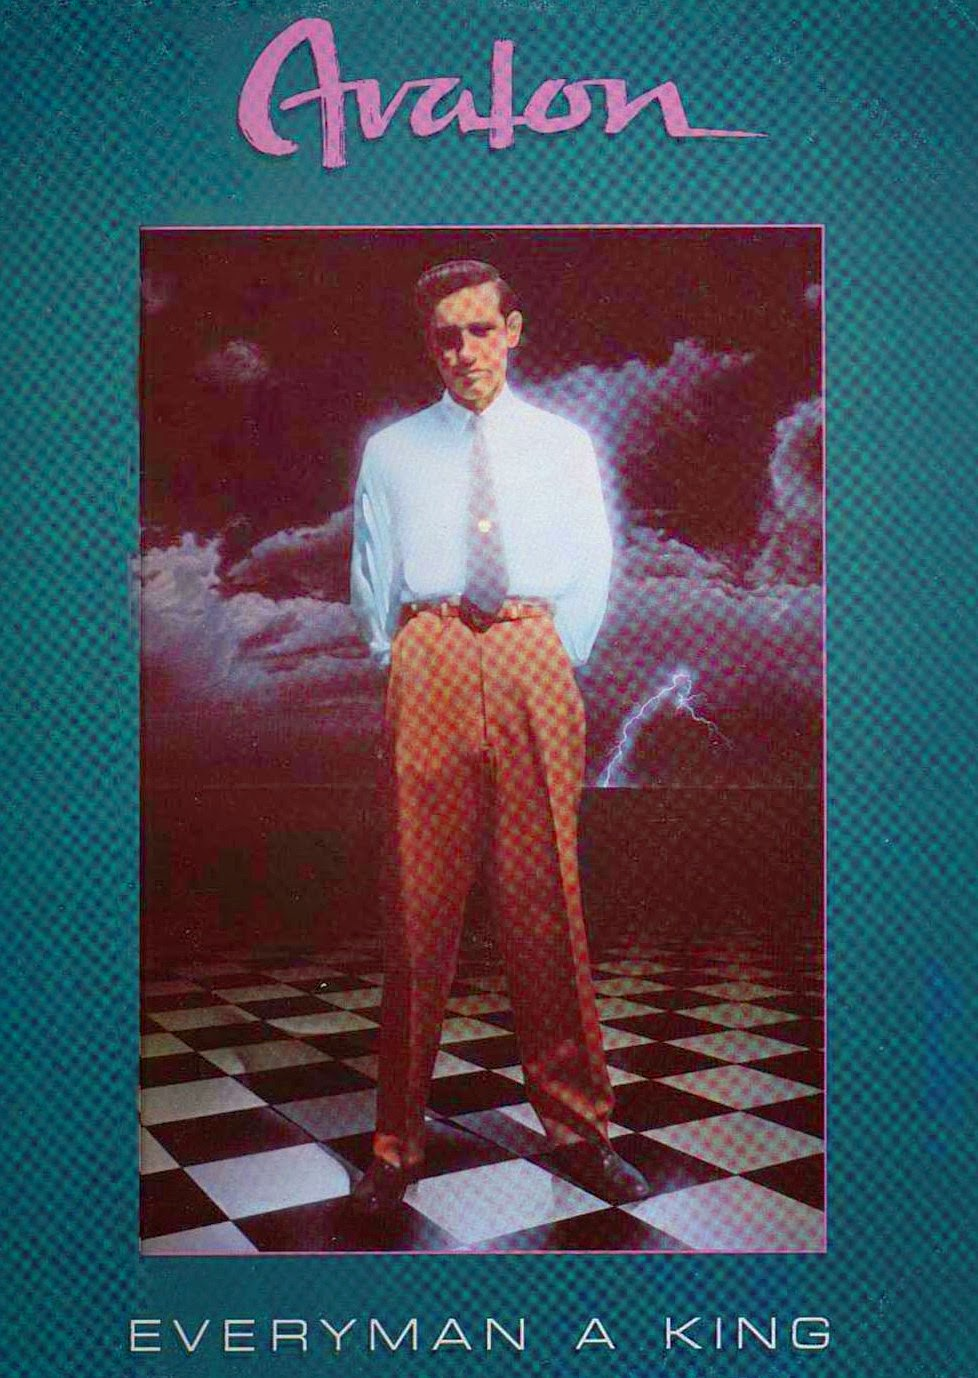 Avalon Everyman a king 1982 aor melodic rock